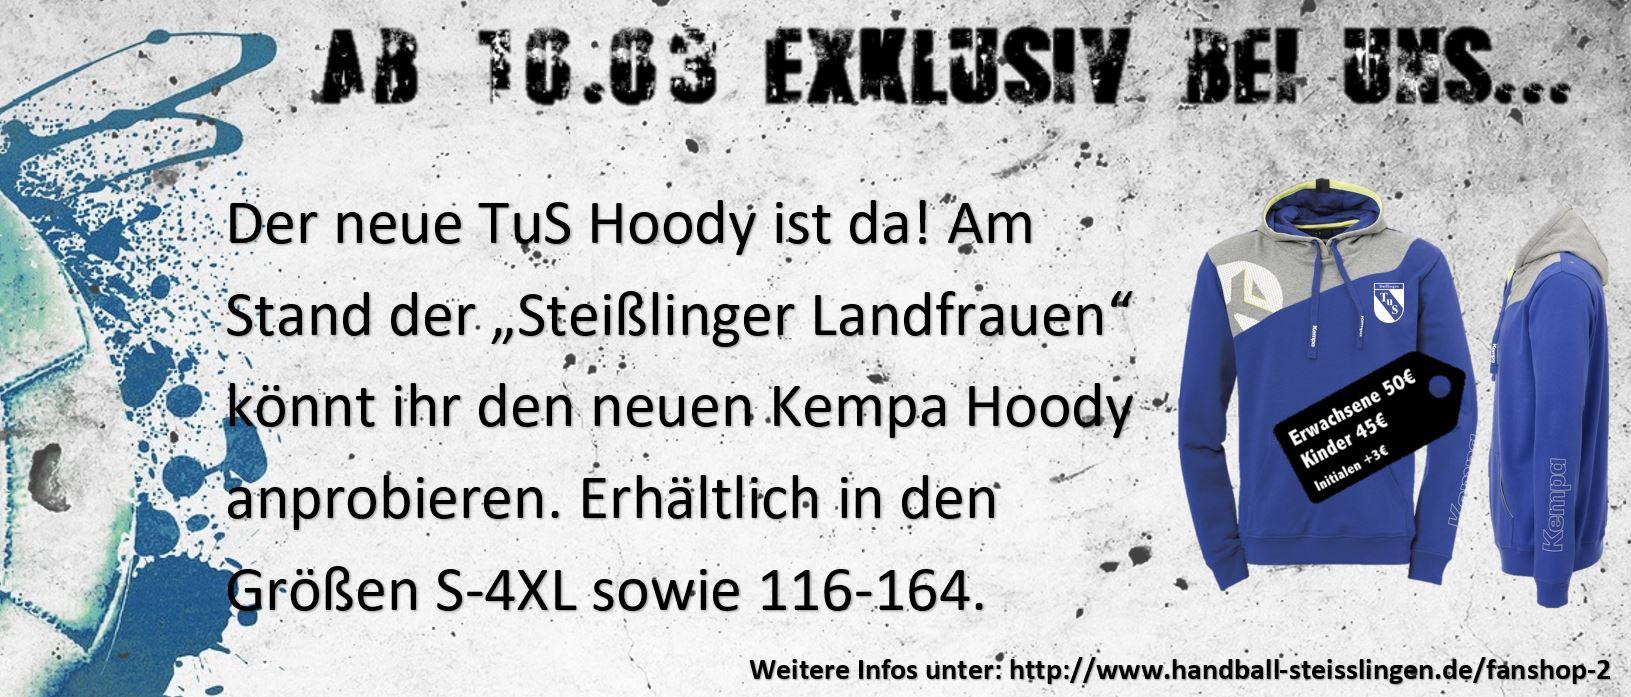 Banner HP - TuS Hoody